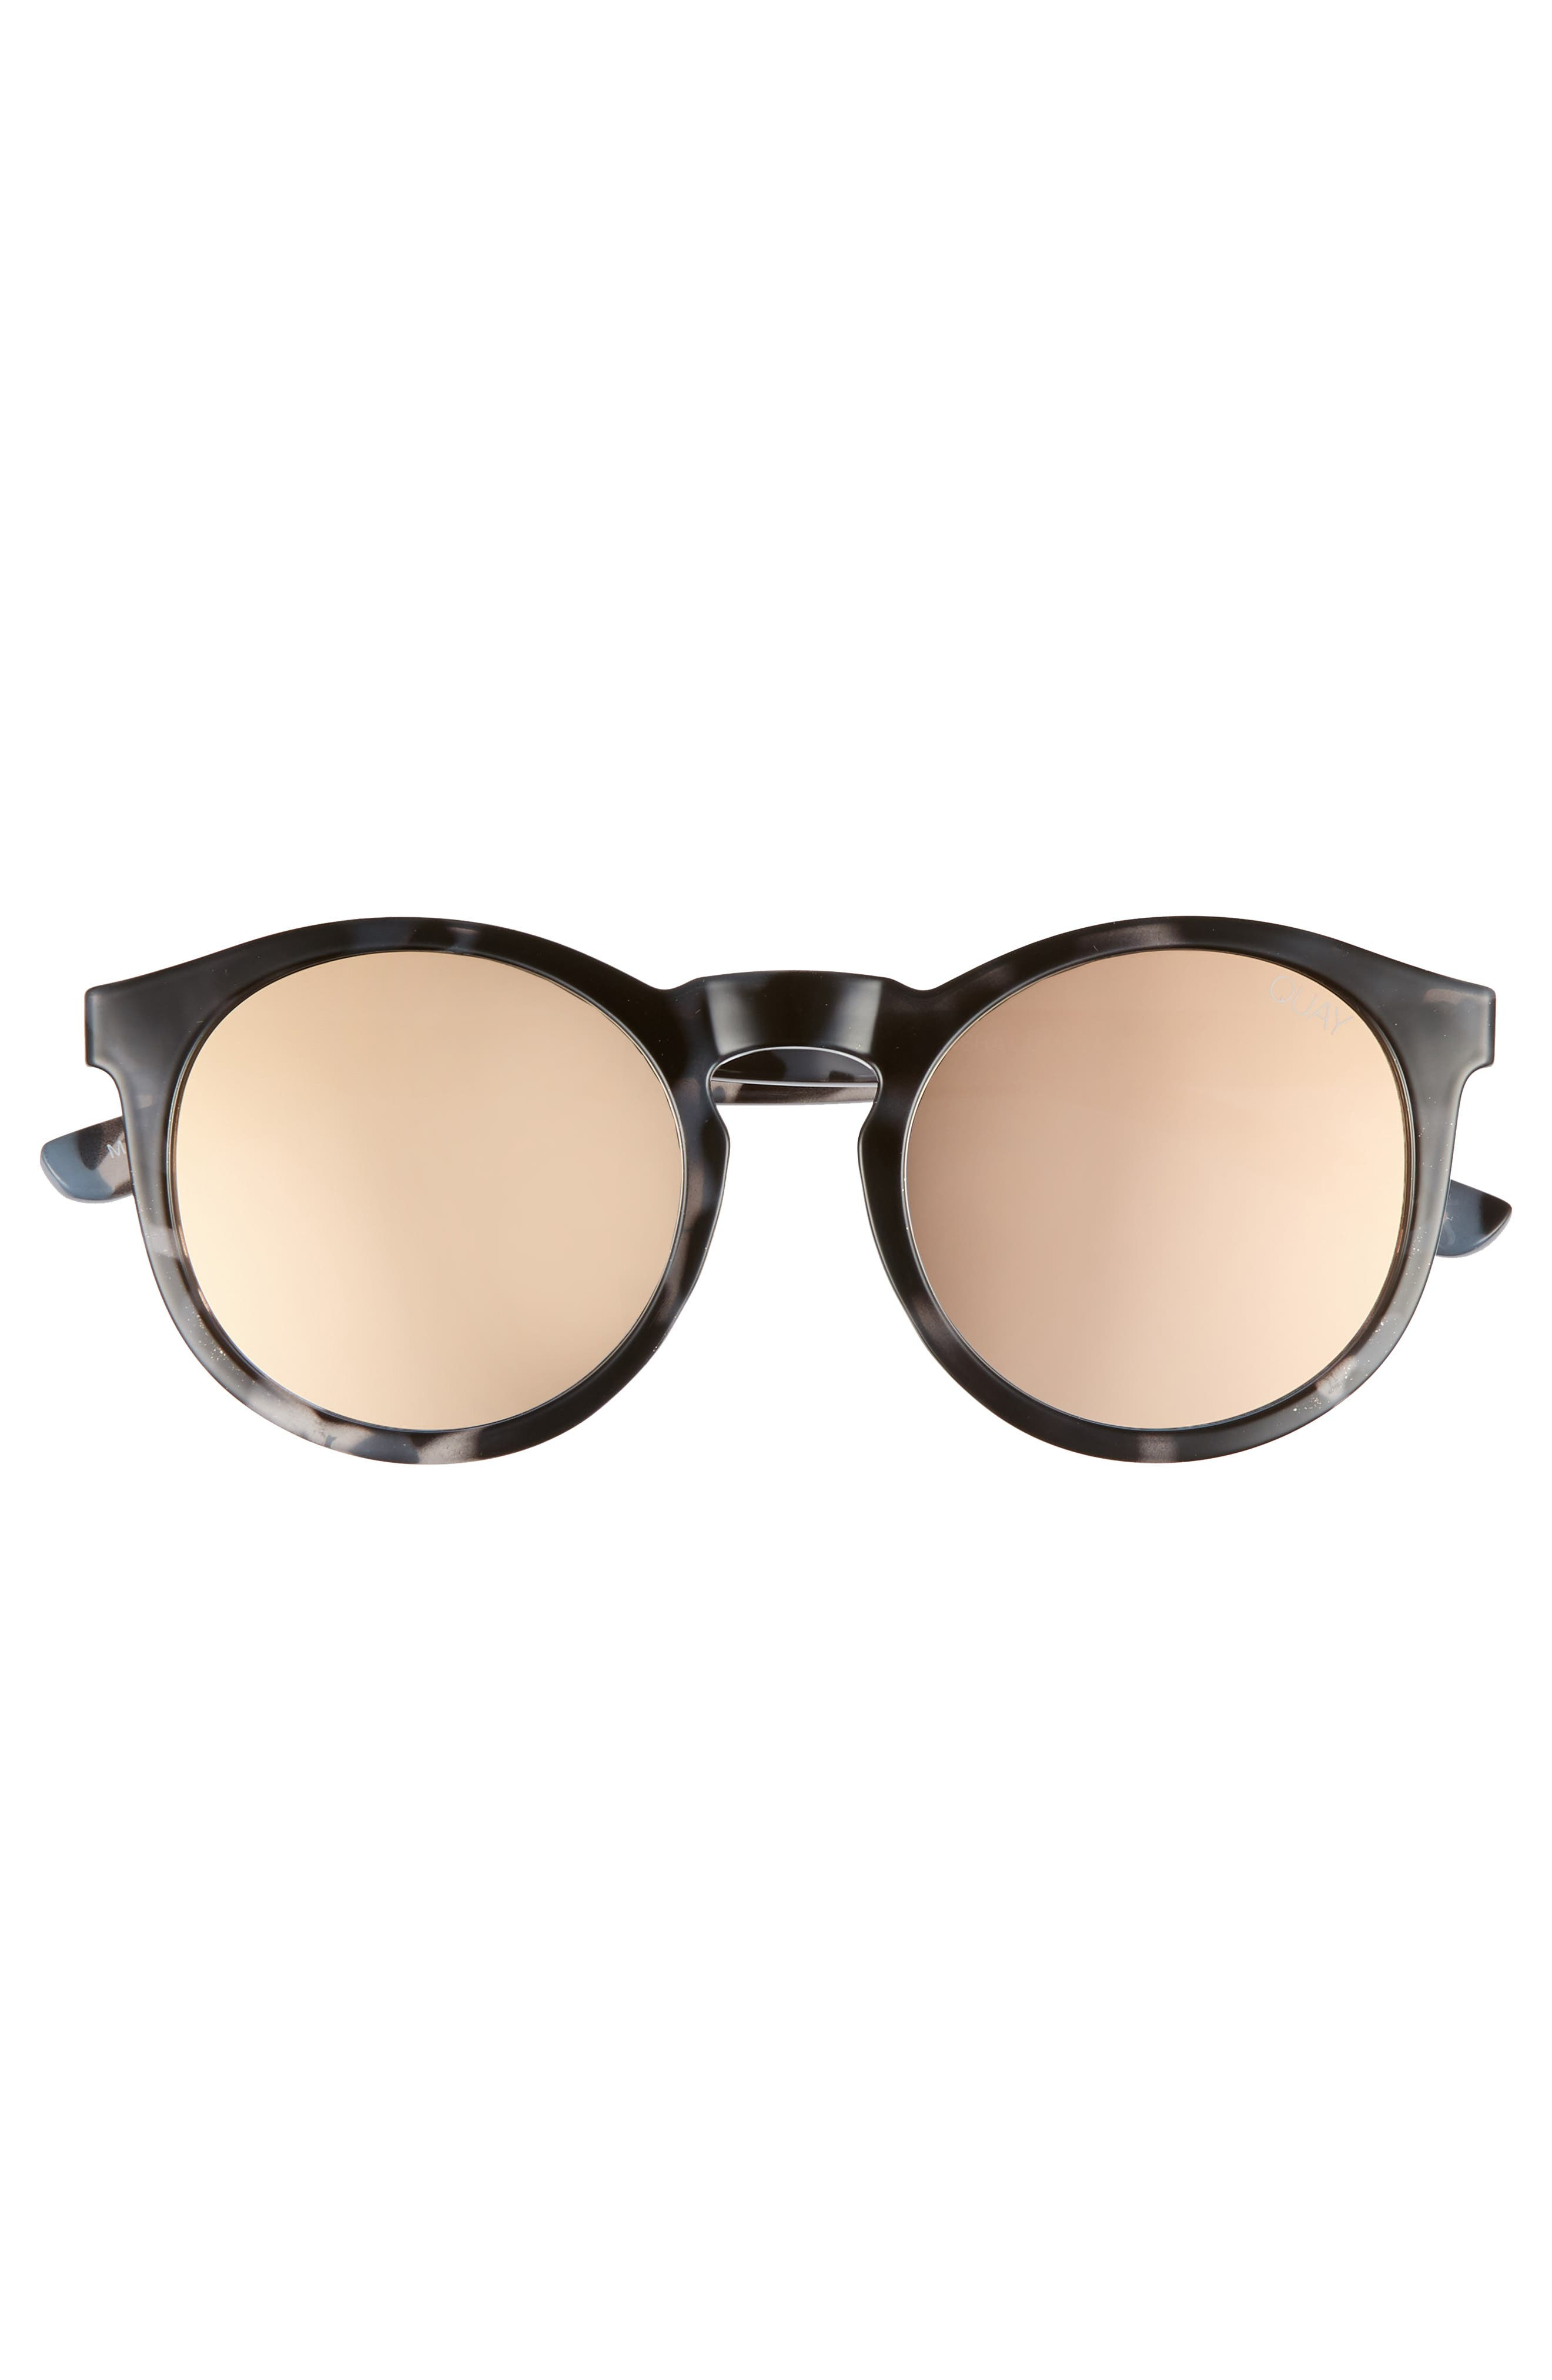 Kosha 49mm Round Sunglasses,                             Alternate thumbnail 6, color,